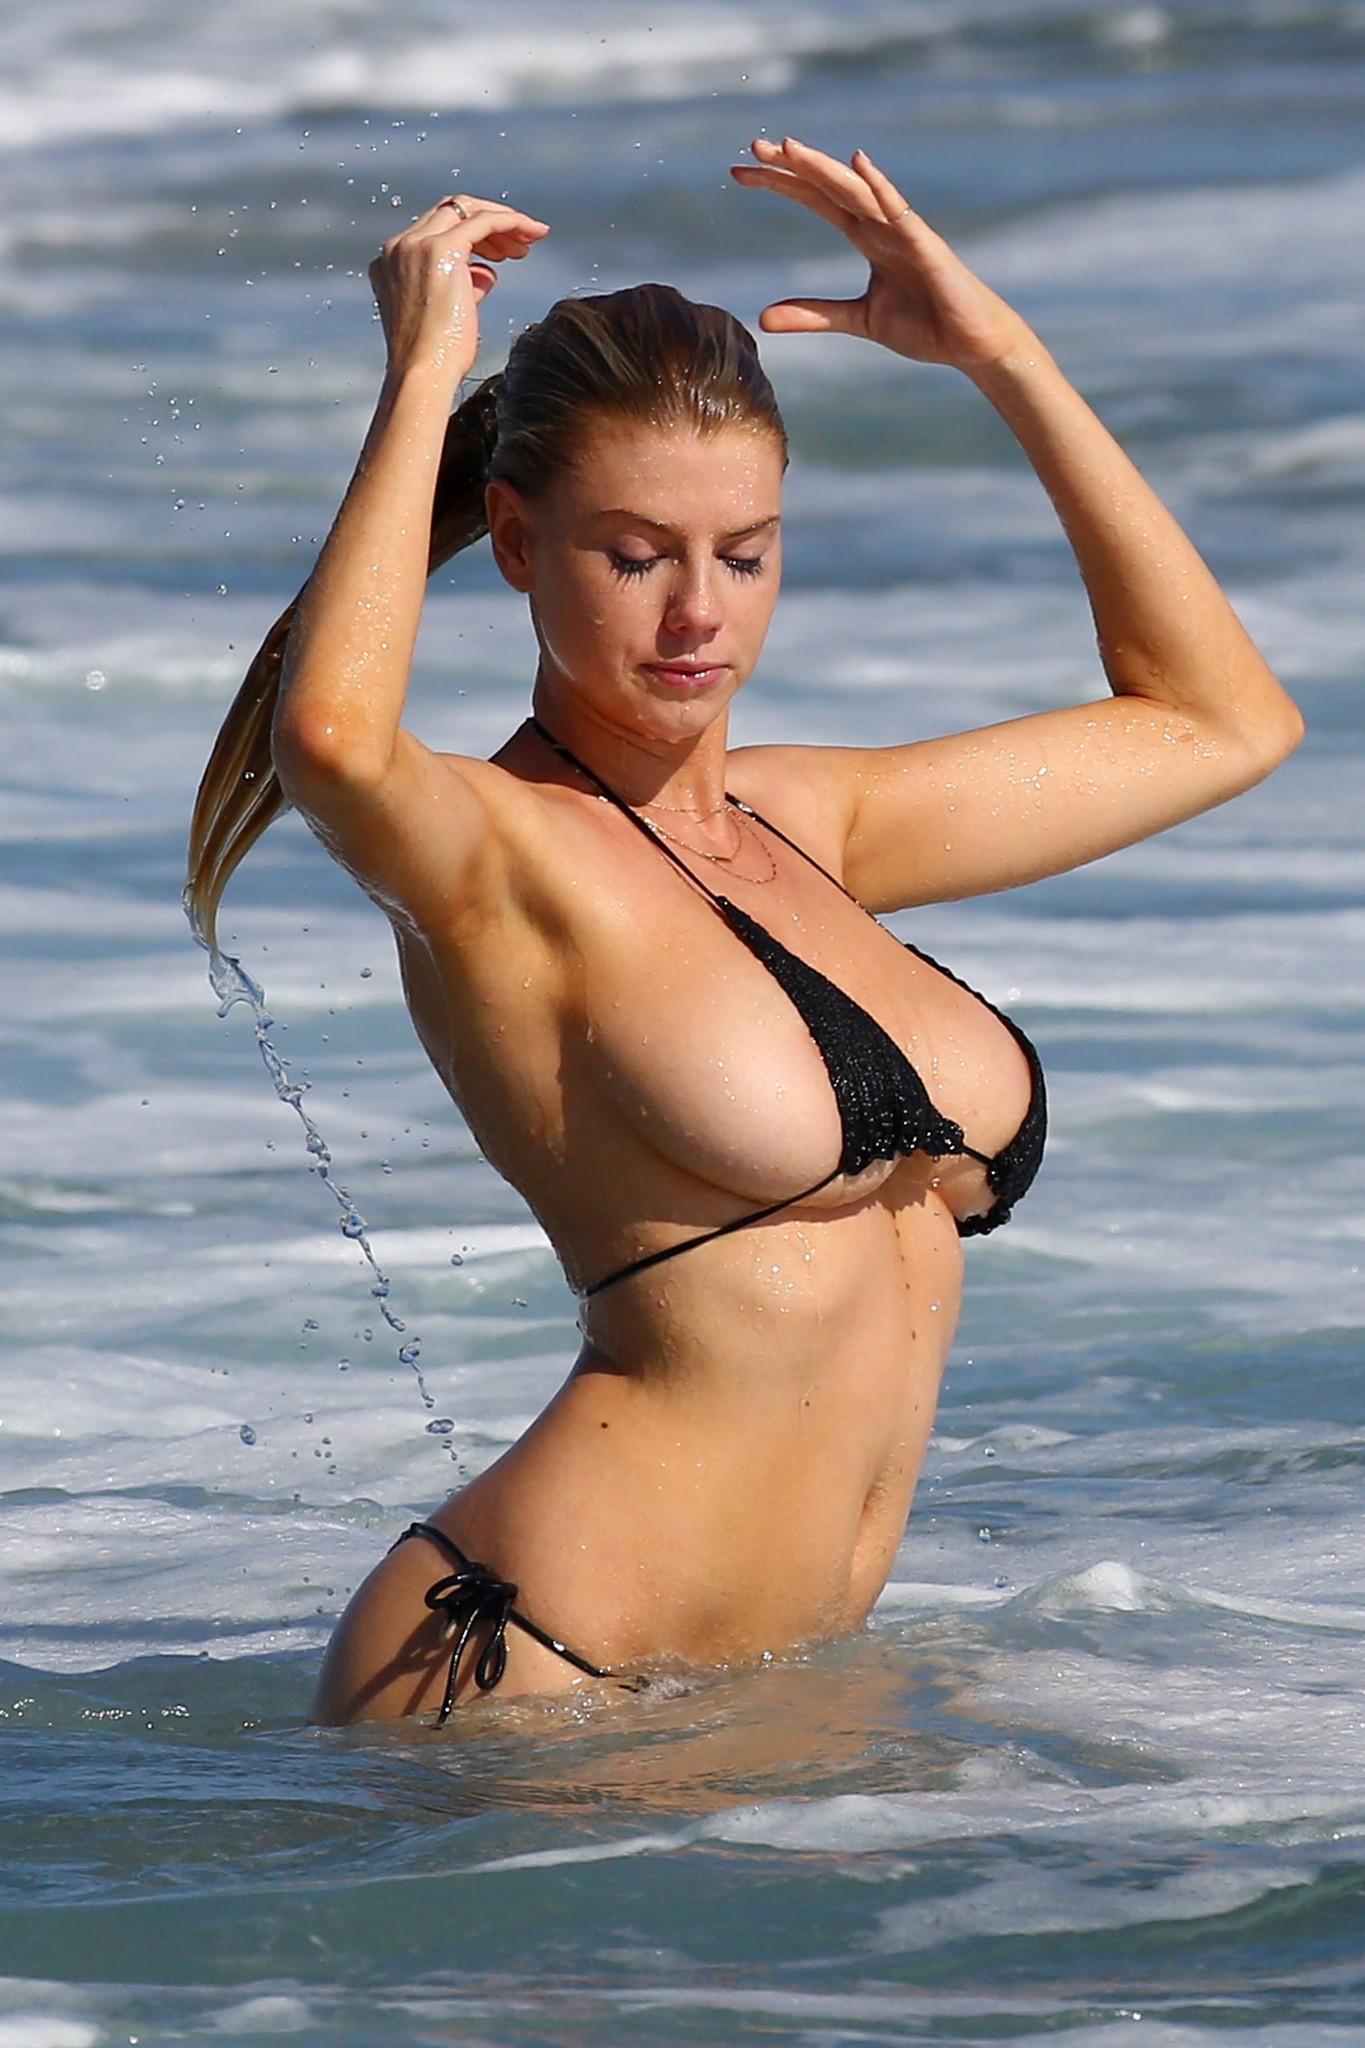 charlotte-mckinney-thong-bikini-areola-slip-in-malibu-09